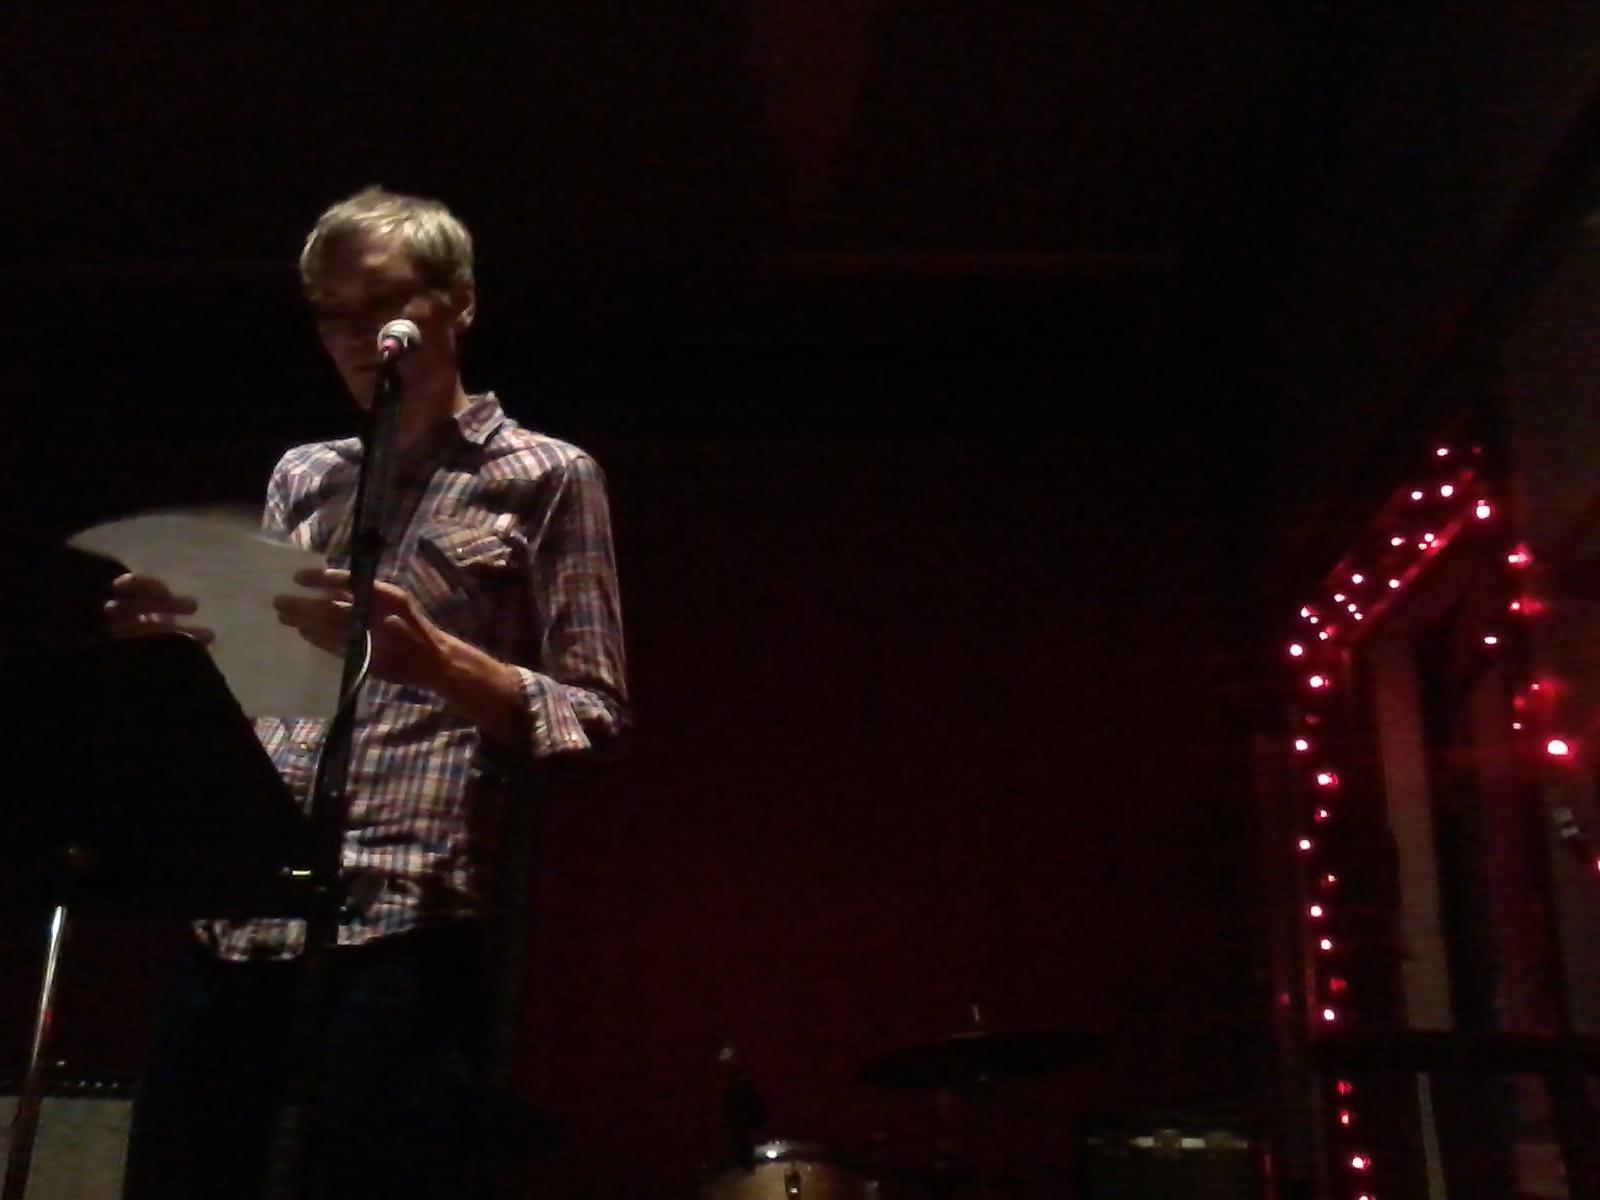 Joel Craig reading at Rozztox